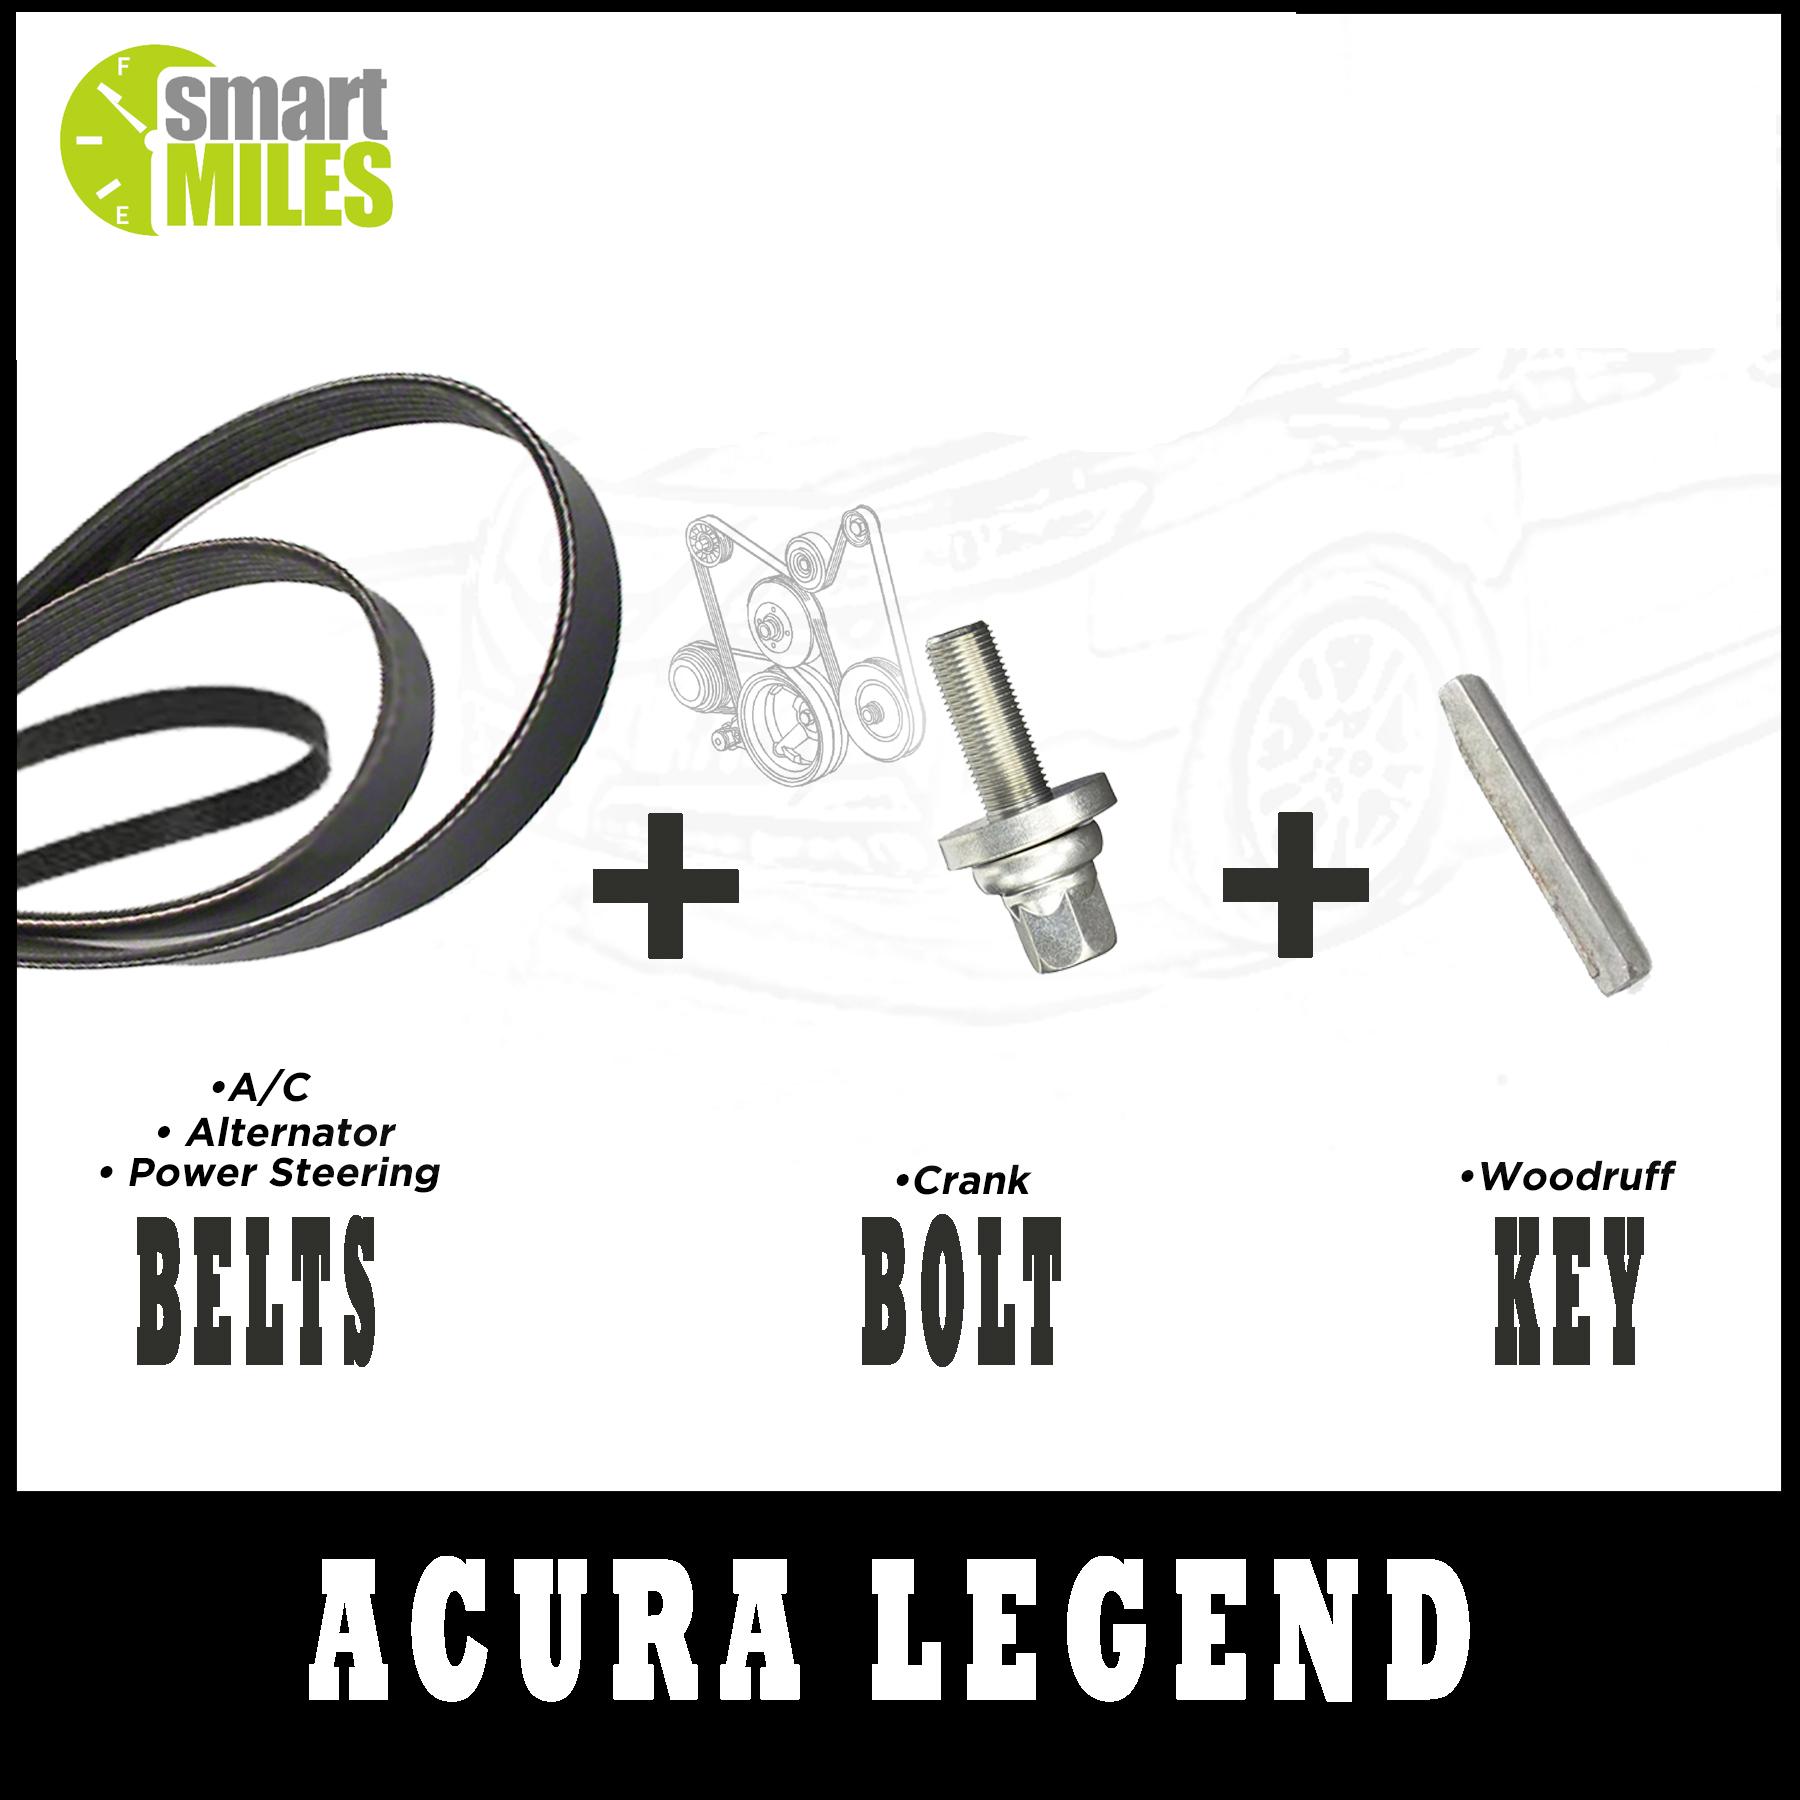 Harmonic Balancer Replacement Kit 1991-1995 Acura Legend